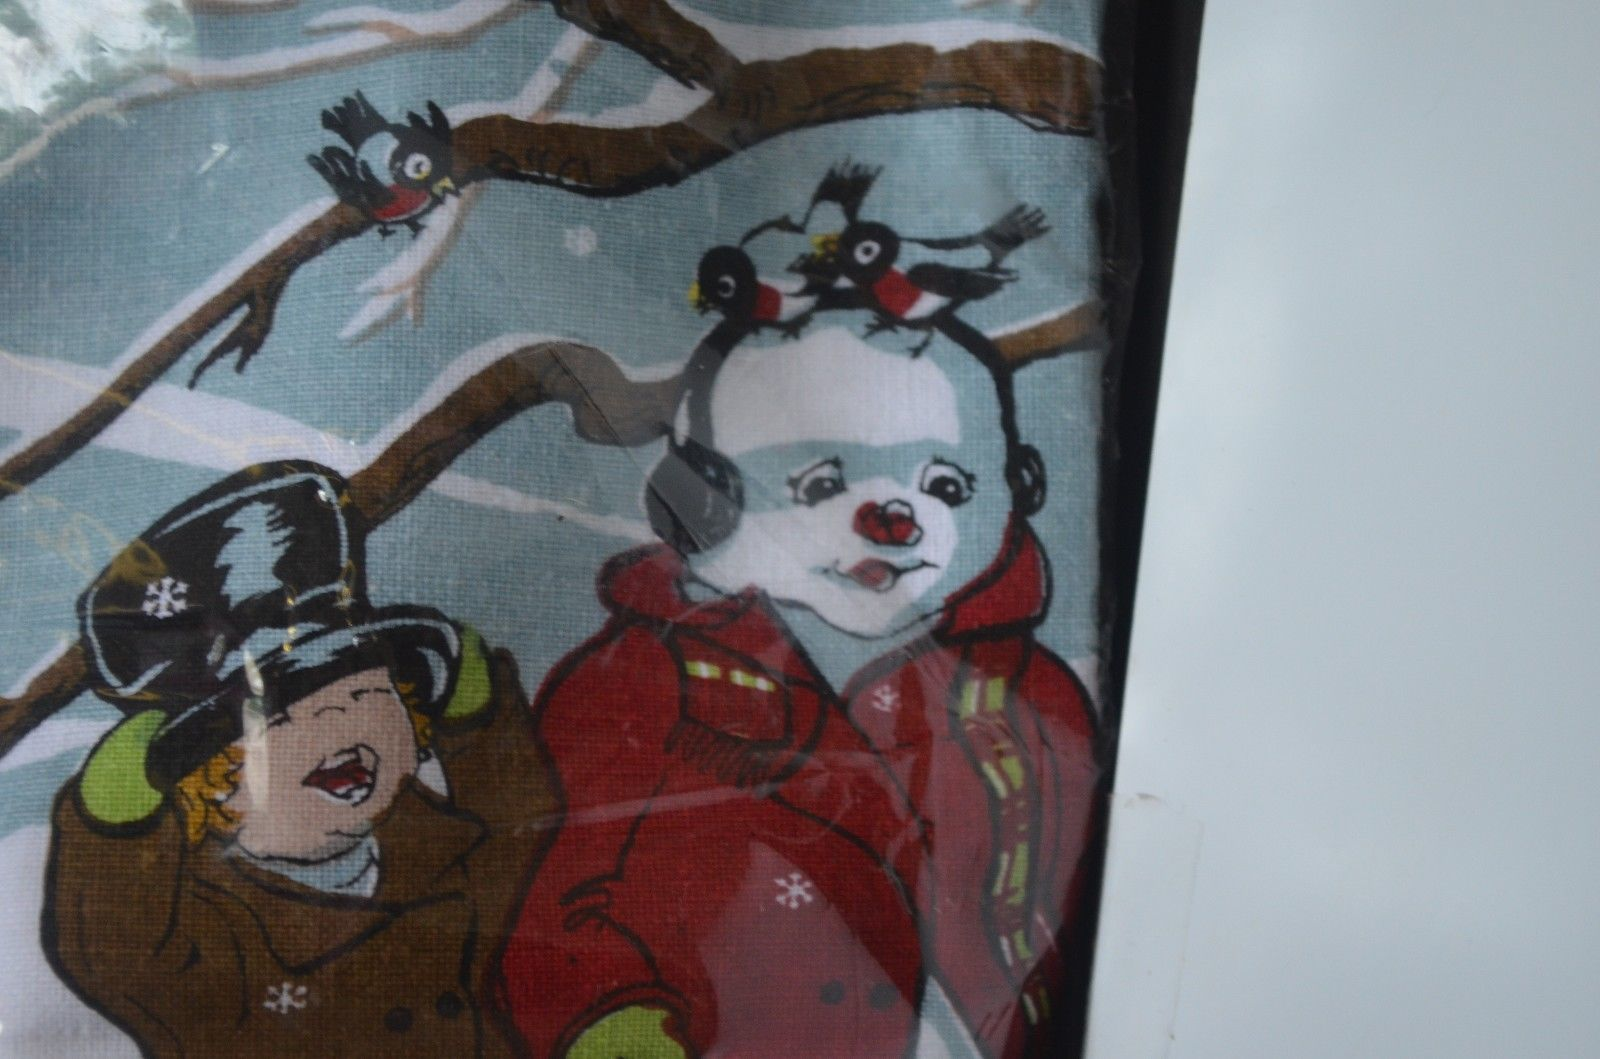 Vintage Set of 2 Hand Screen Print Kitchen Towels Featuring Snowman & Child NIP